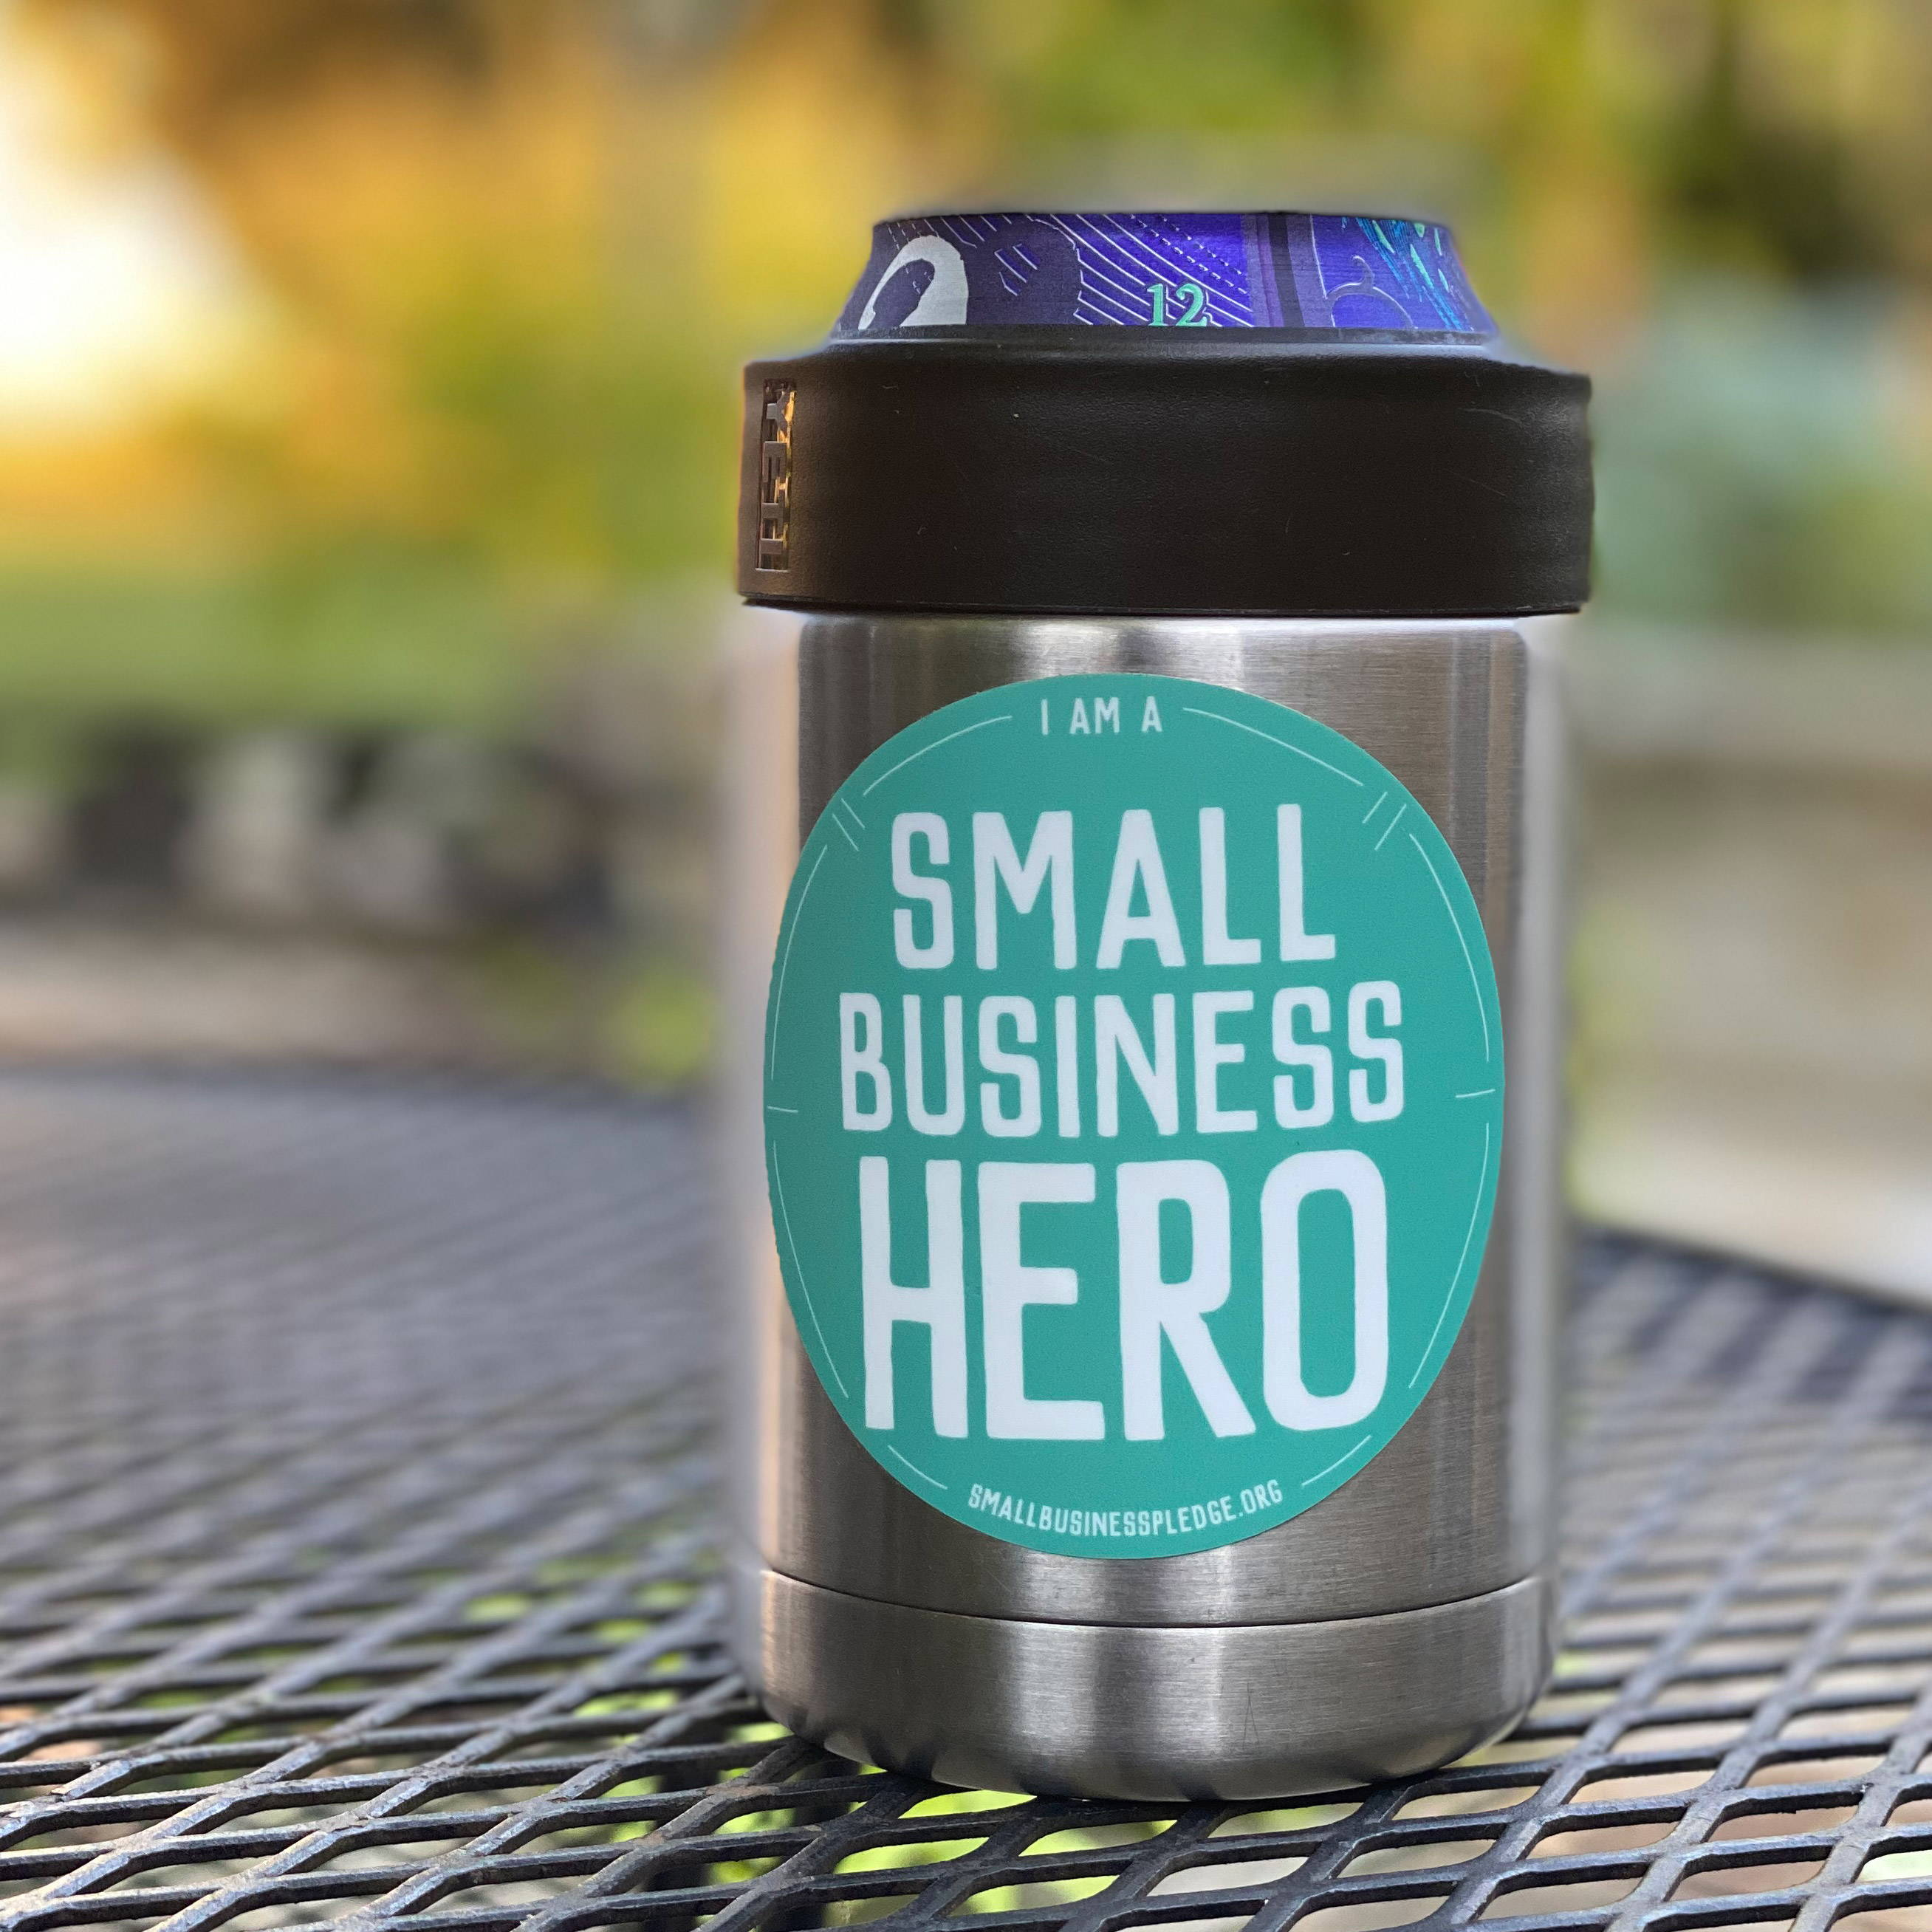 Small business hero sticker